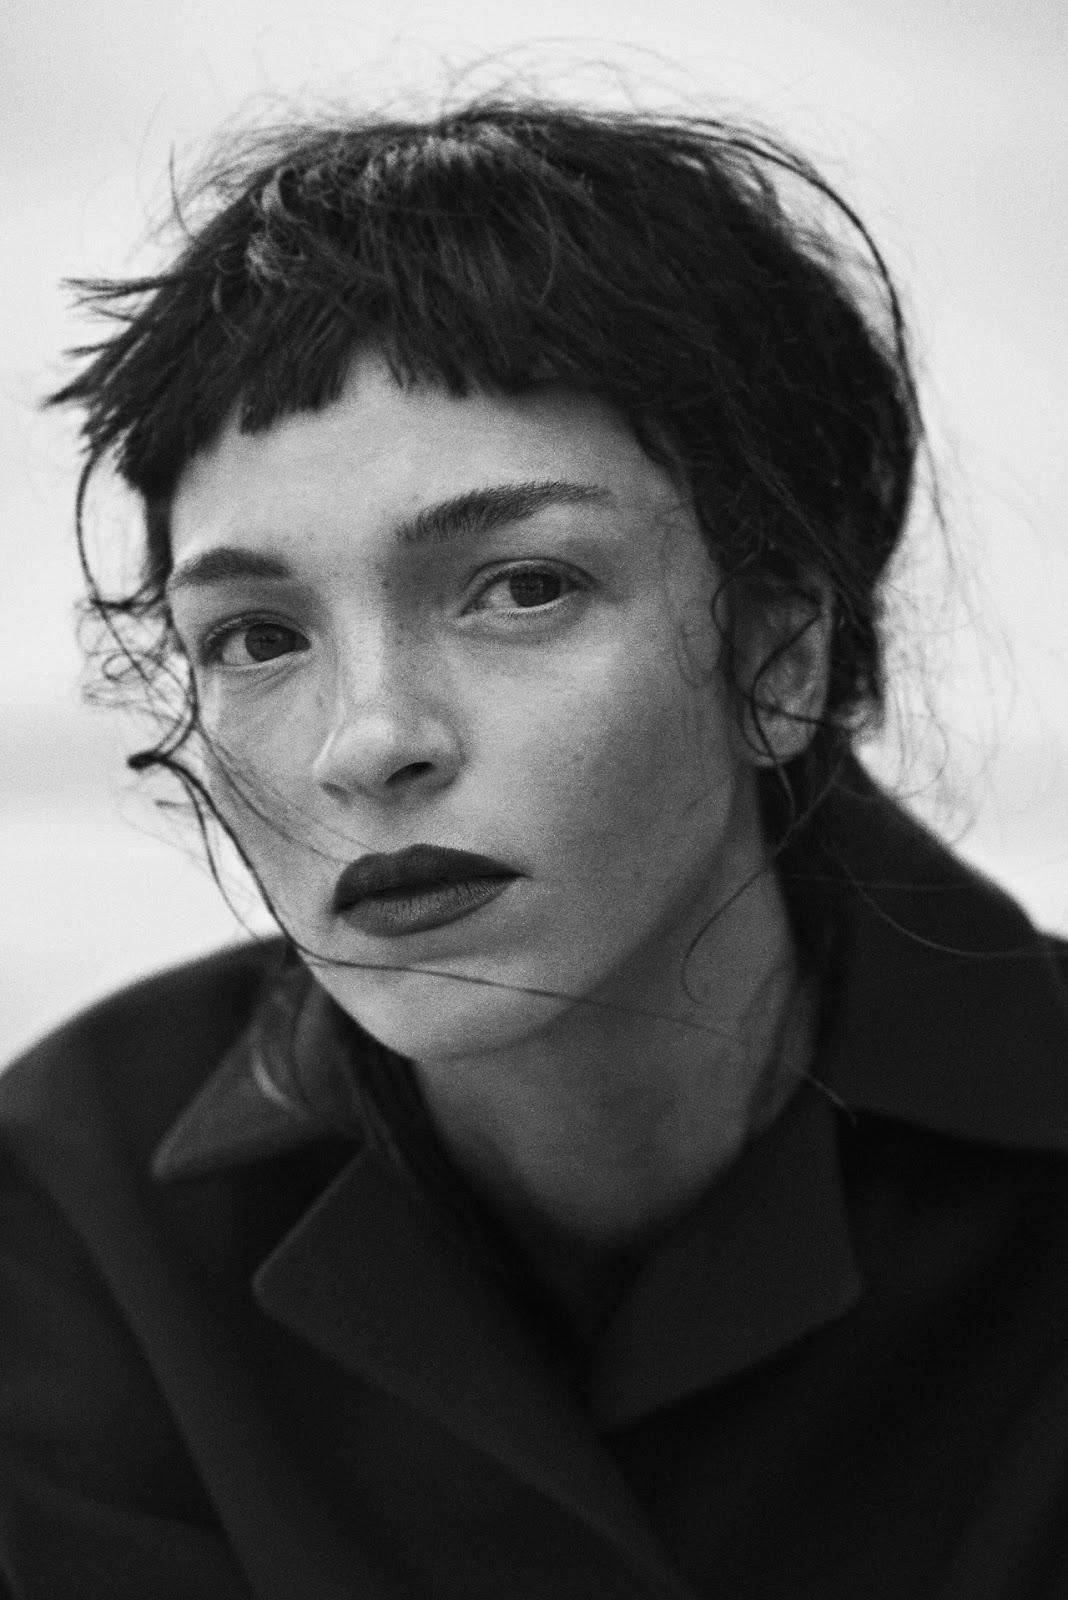 Smile Mariacarla Boscono In Vogue Italia November 2014 By